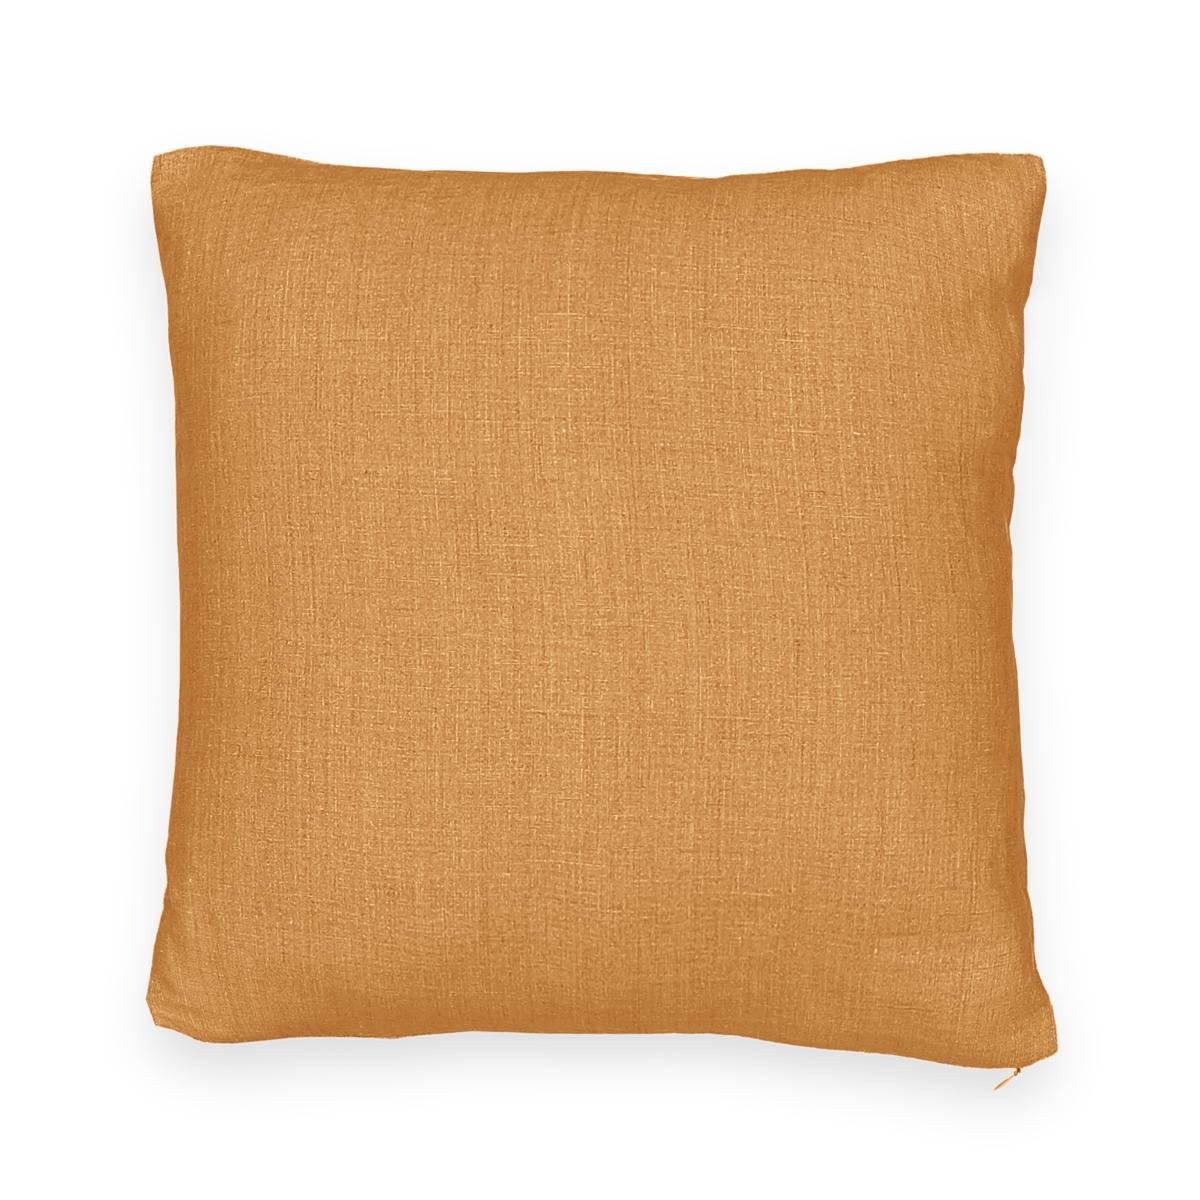 Чехол на подушку-валик из стираного льна, ONEGA